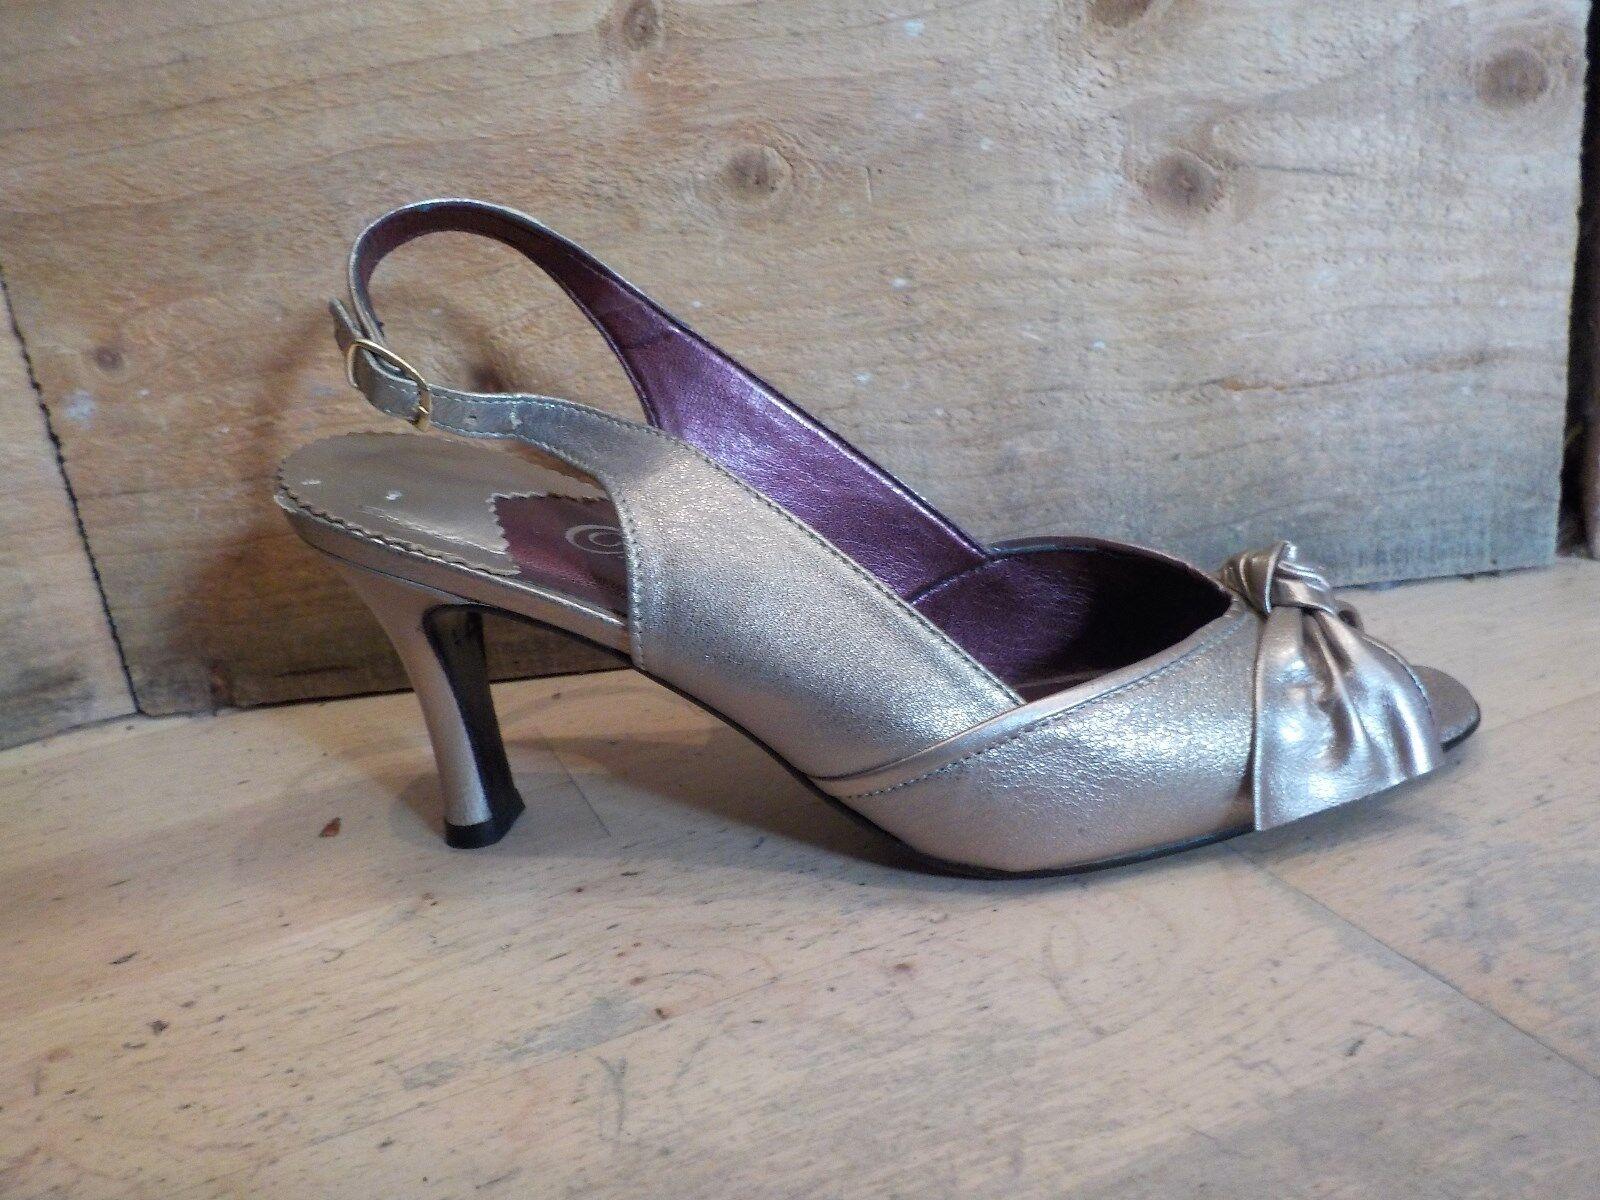 Orlando Storm Schuhe Pewter/ Pearl Cream Leder Schuhe Storm GAVOTTE Größe 5 9eebac